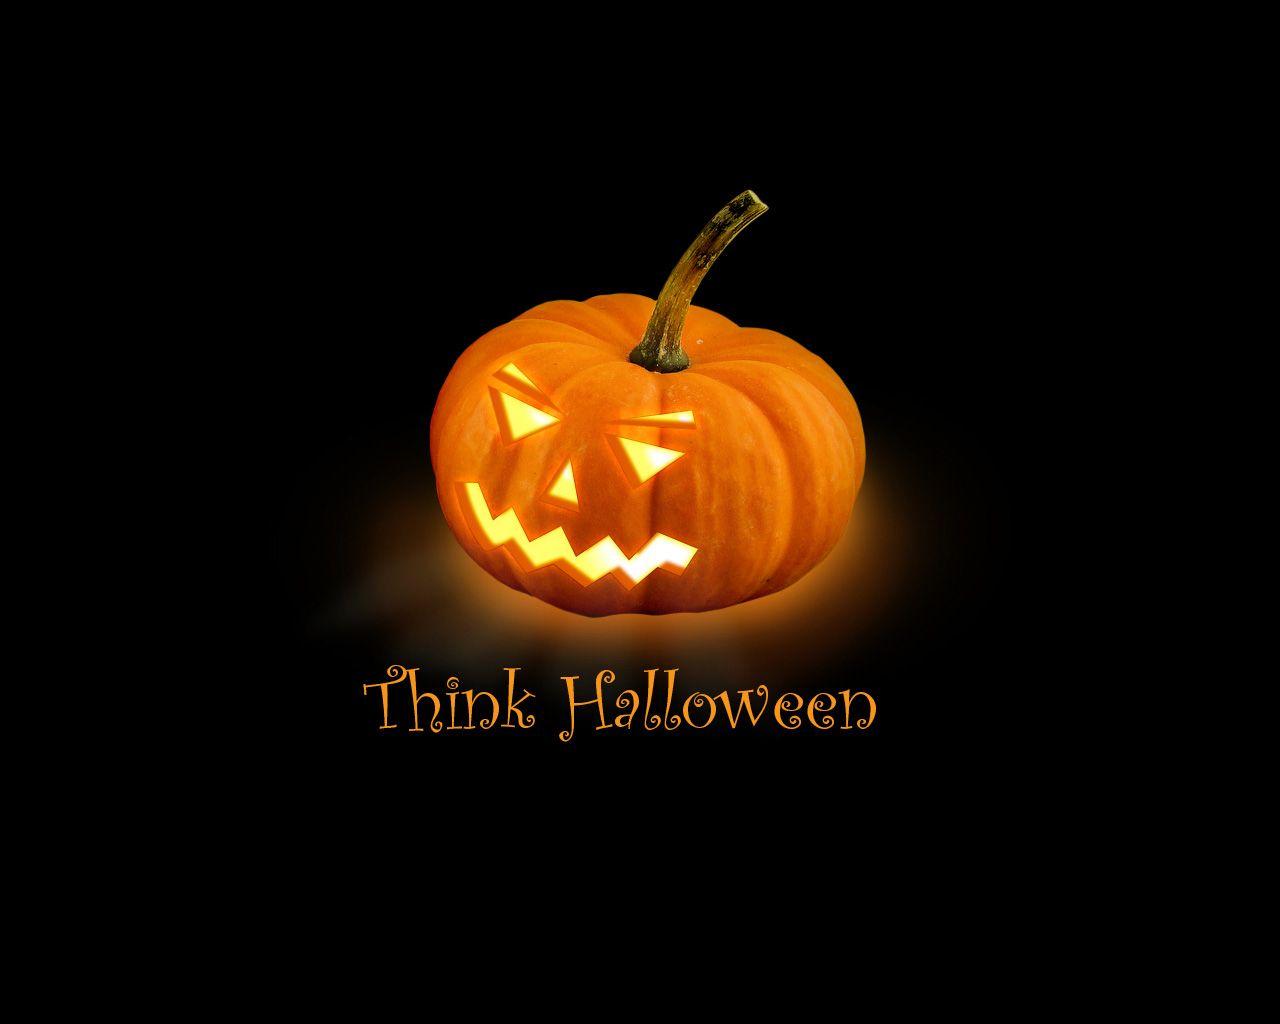 Think Halloween Pumpkin Halloween Halloween Pictures Happy Halloween  Halloween Images Halloween Ideas Happy Halloween Quotes